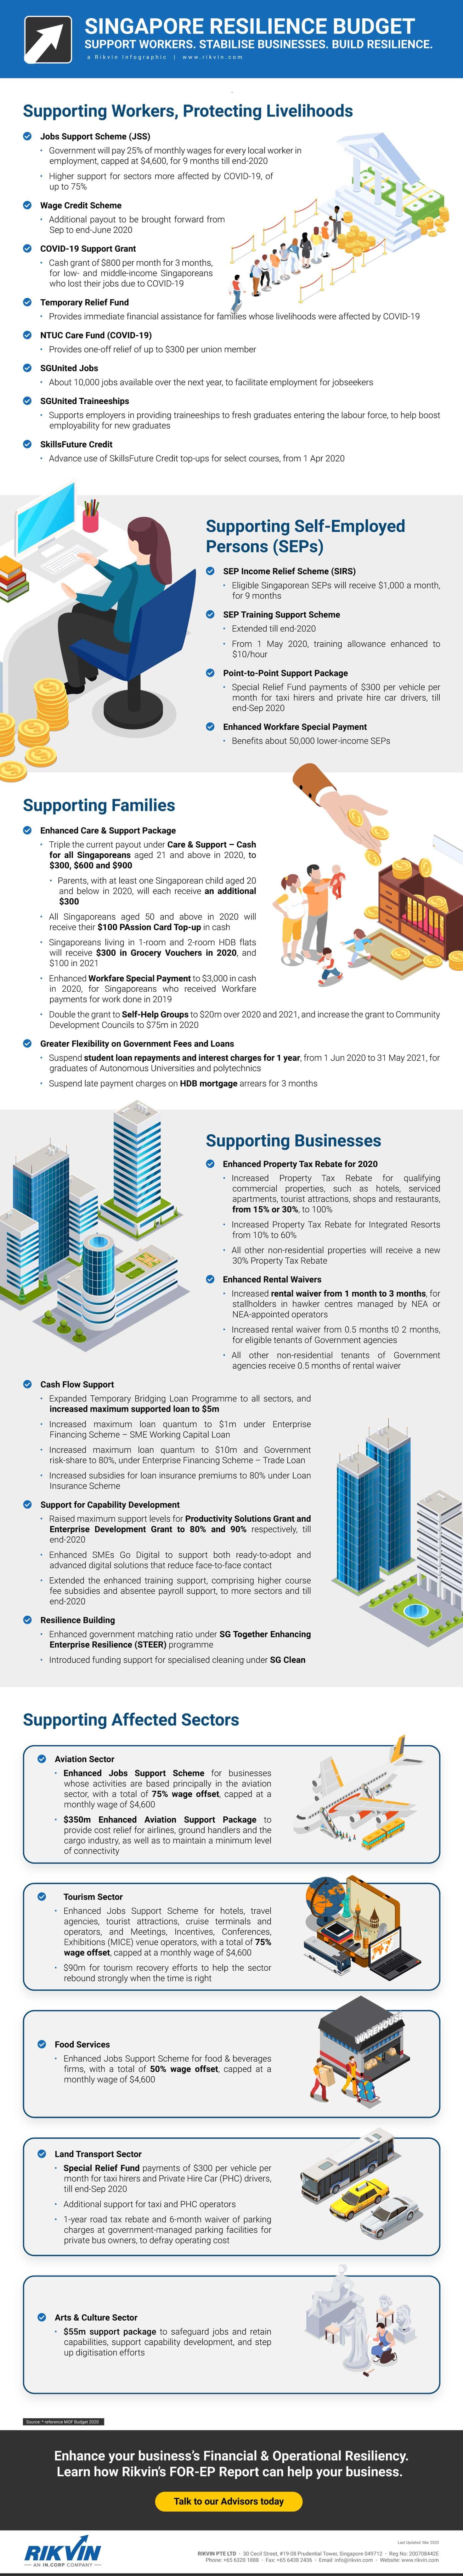 Singapore Resilience Budget 2020